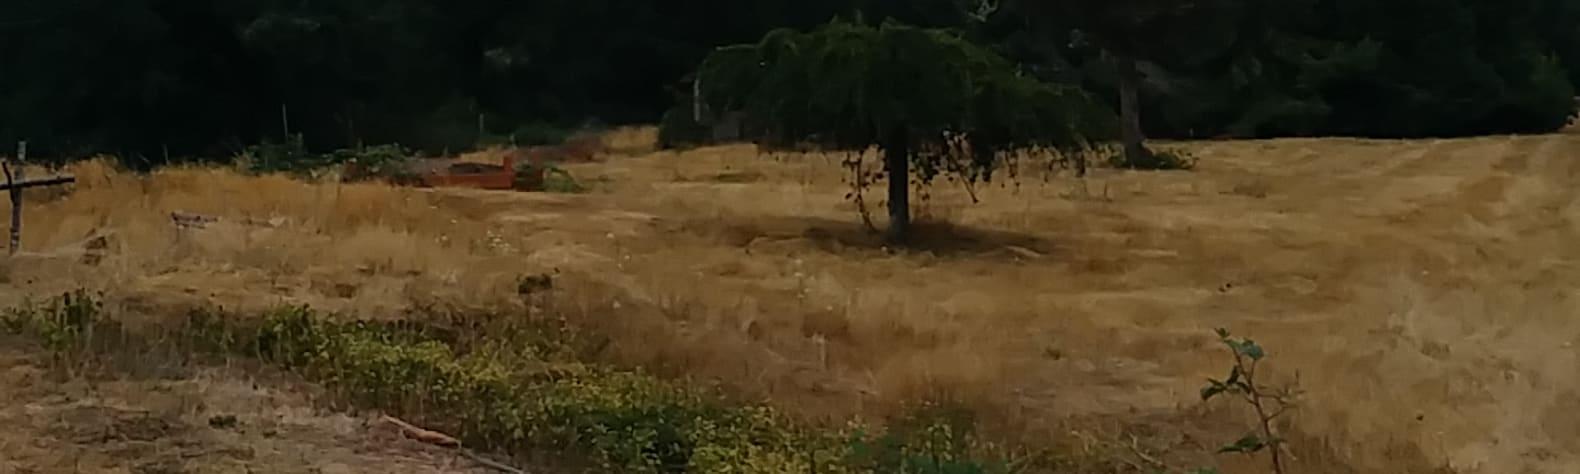 Woodland Hills Ranch